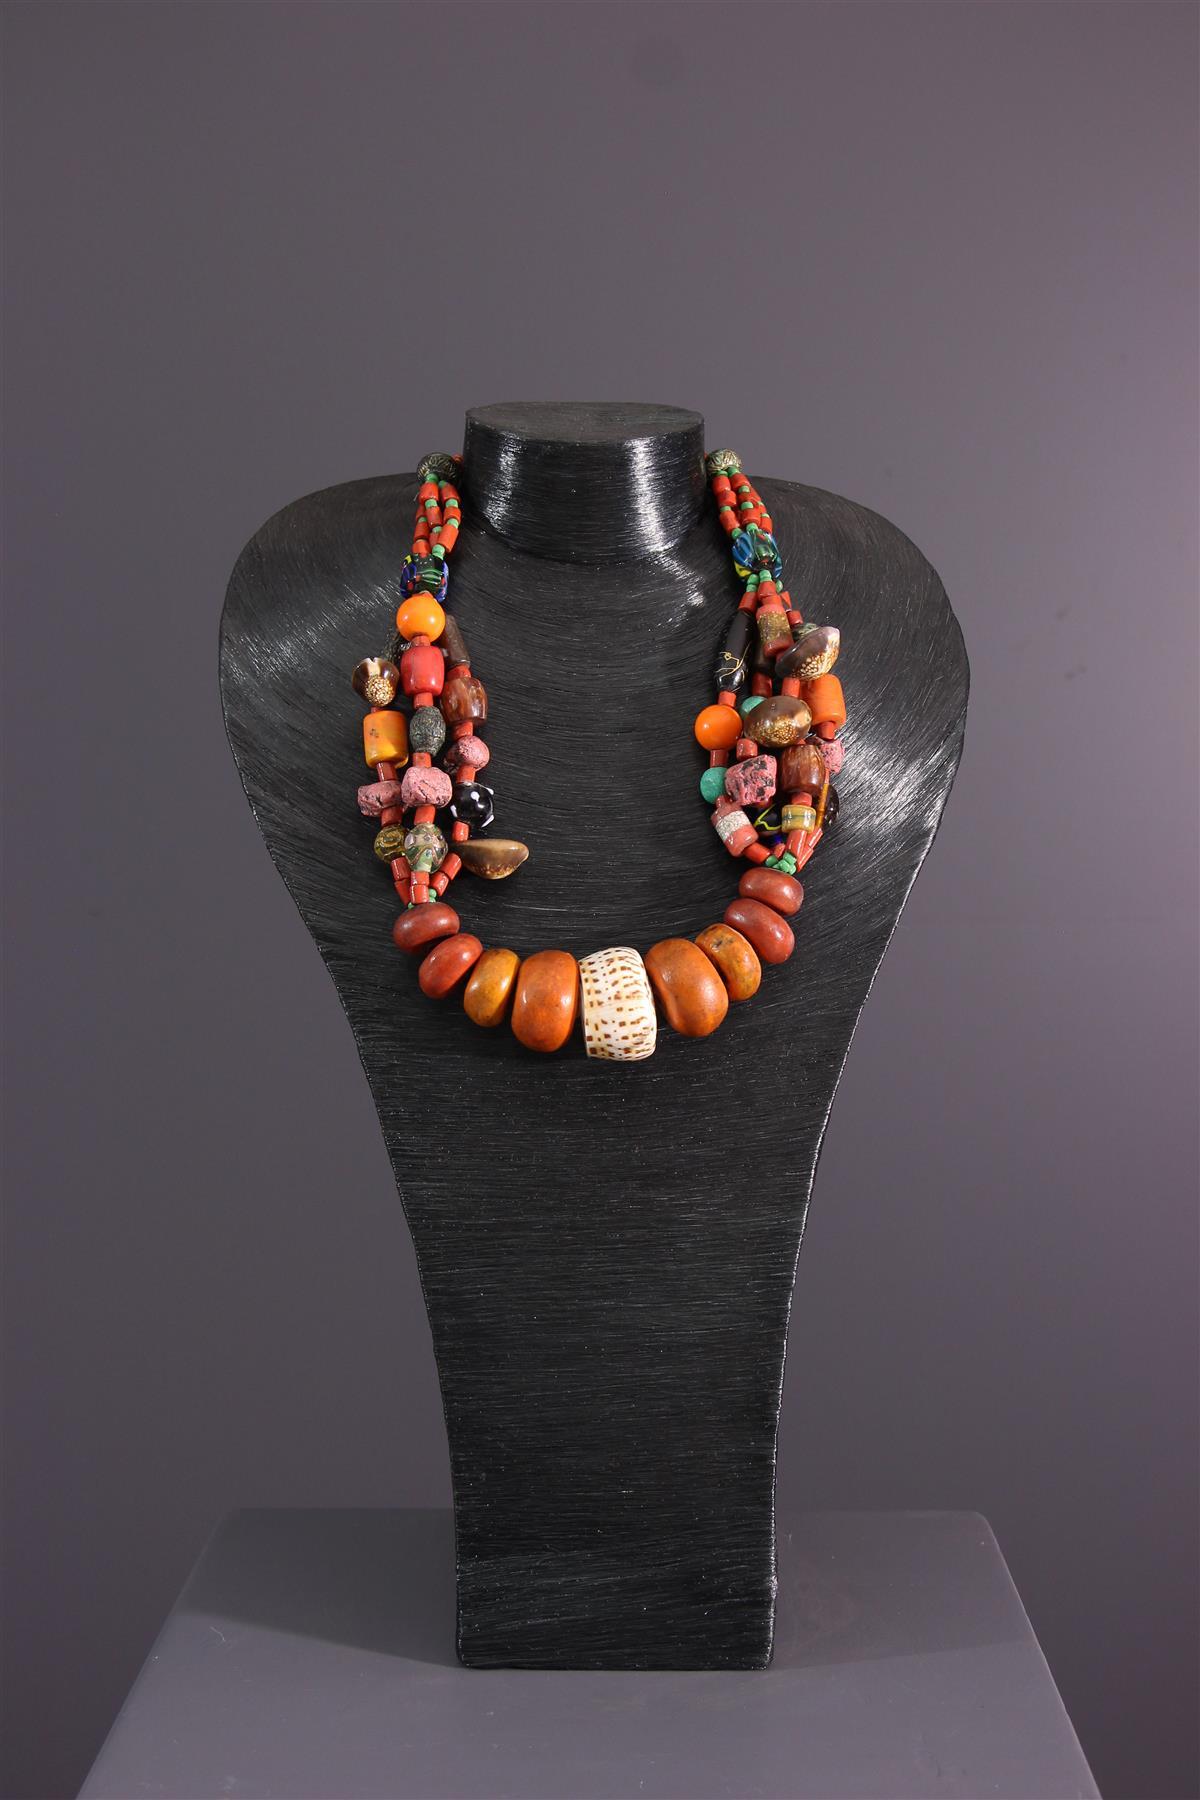 Berber necklace - African art